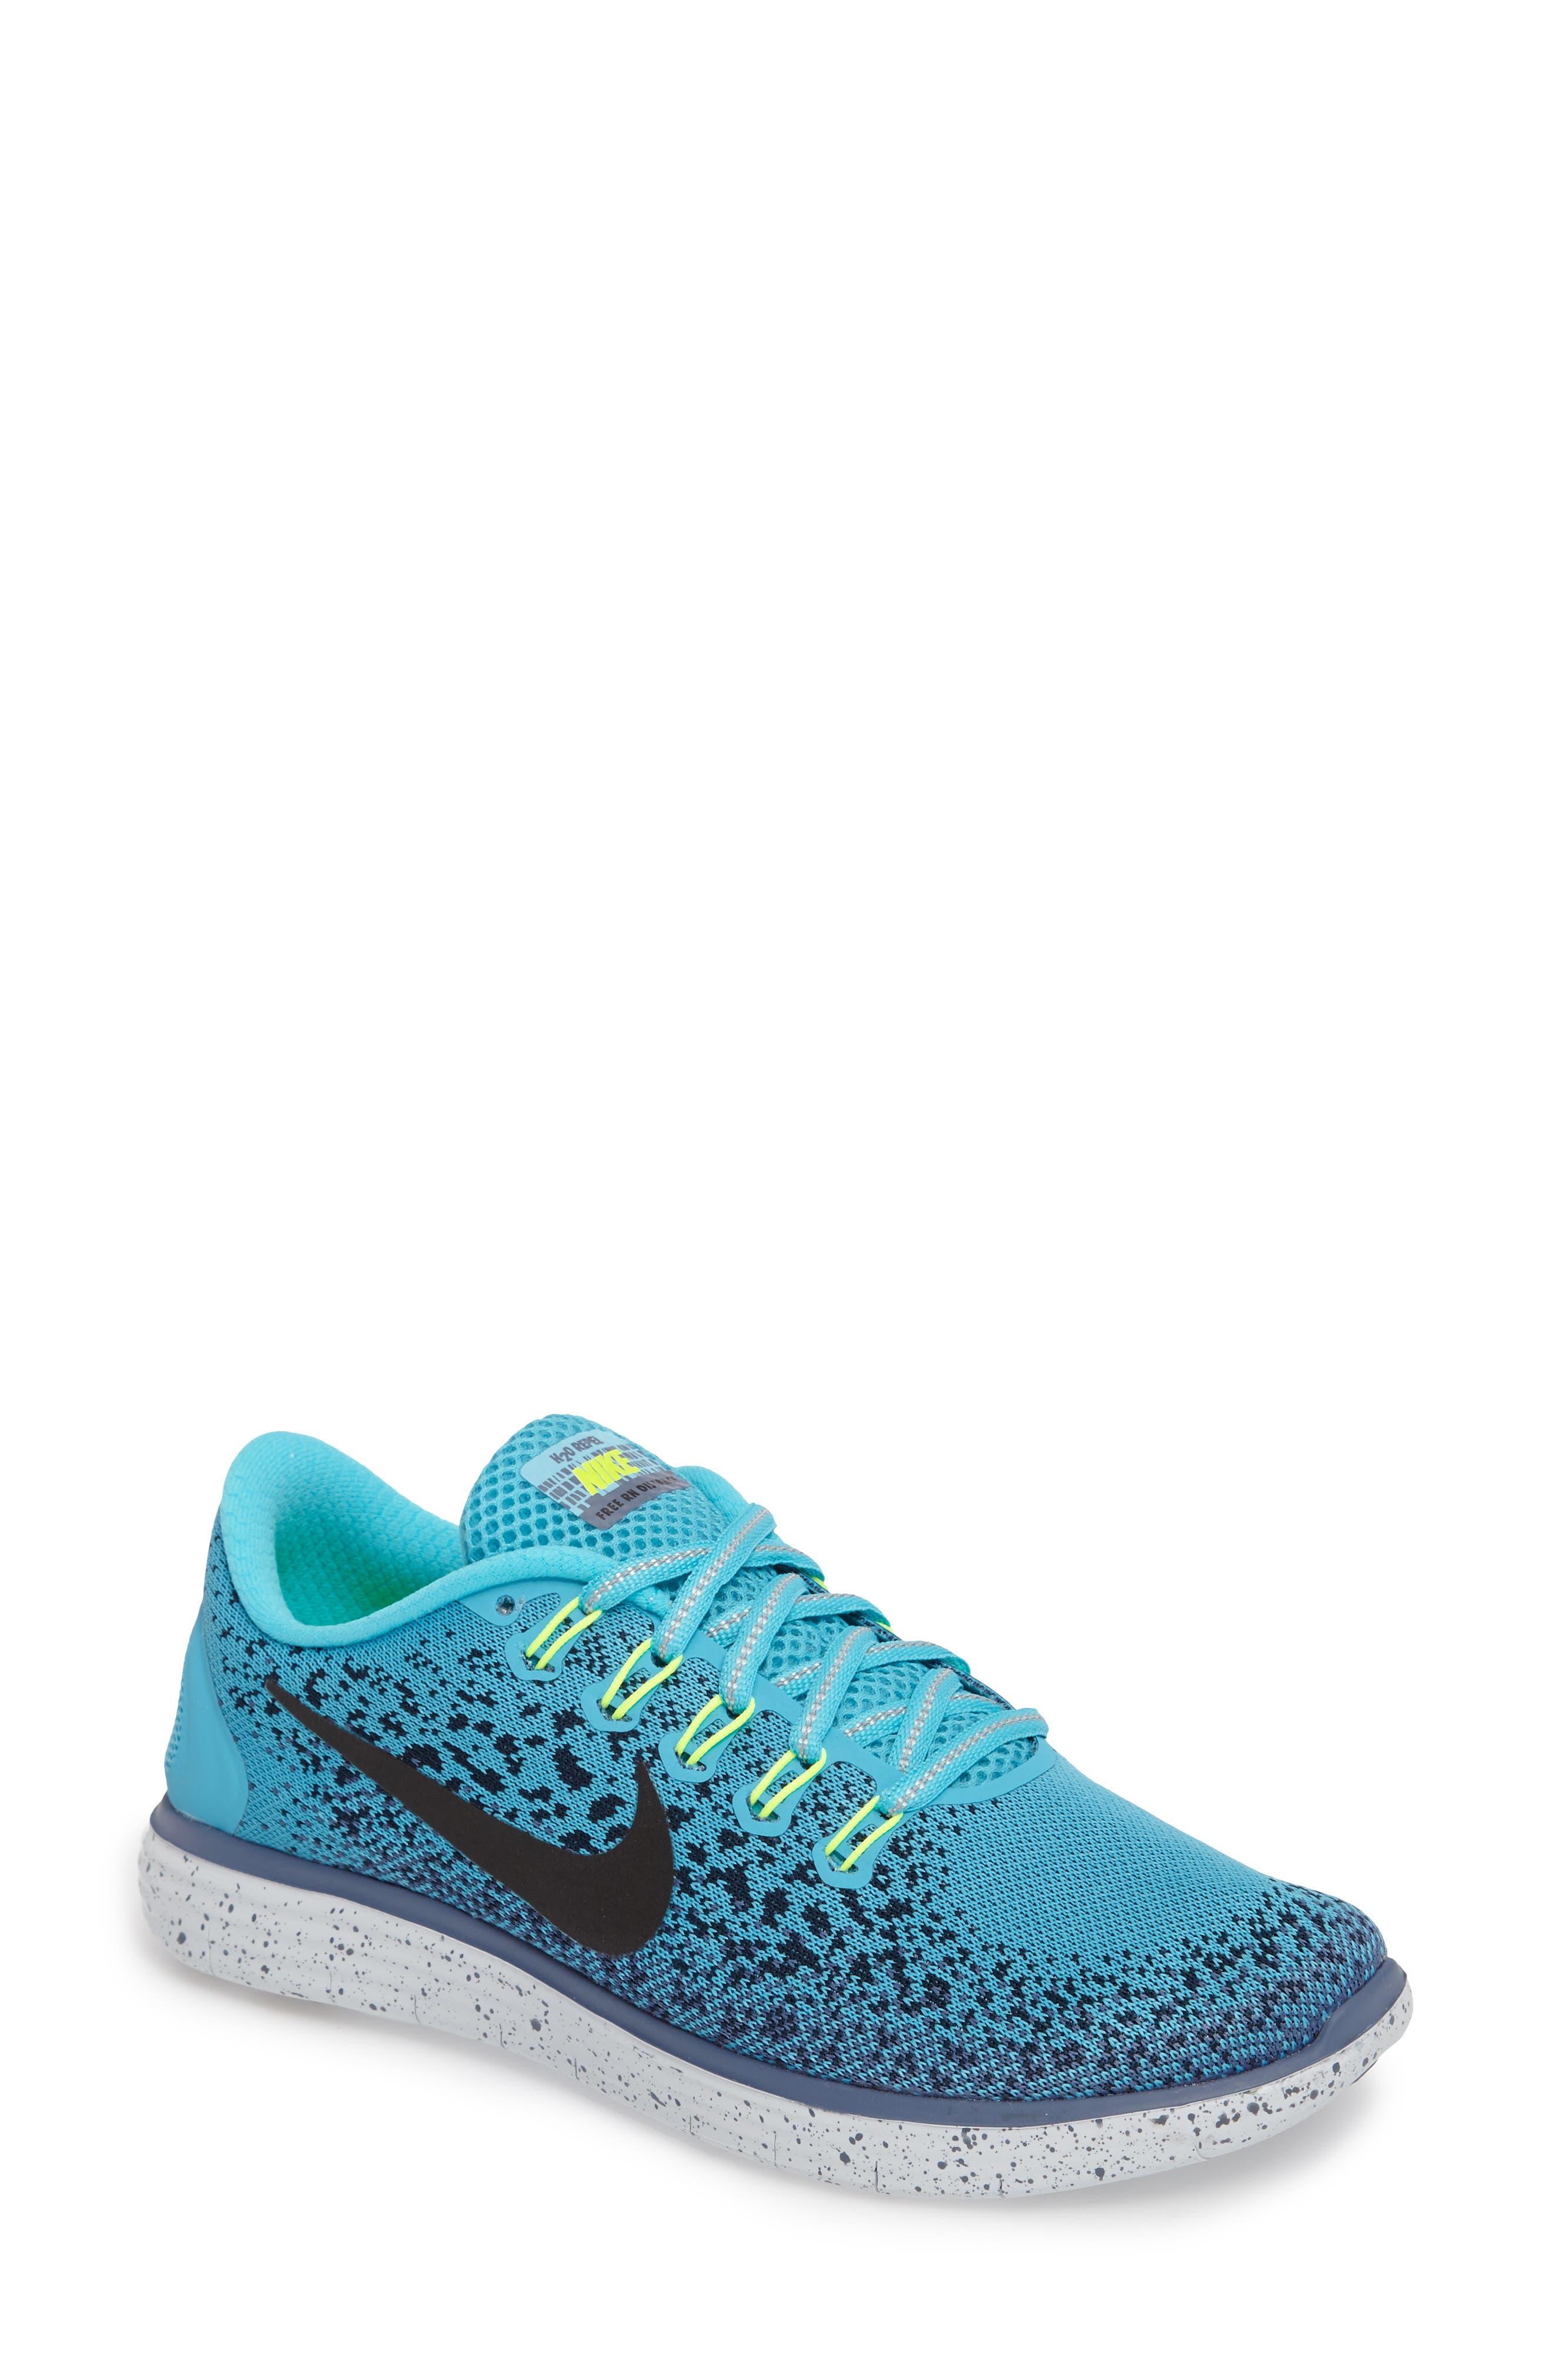 Alternate Image 1 Selected - Nike Free RN Distance Shield Running Shoe (Women)